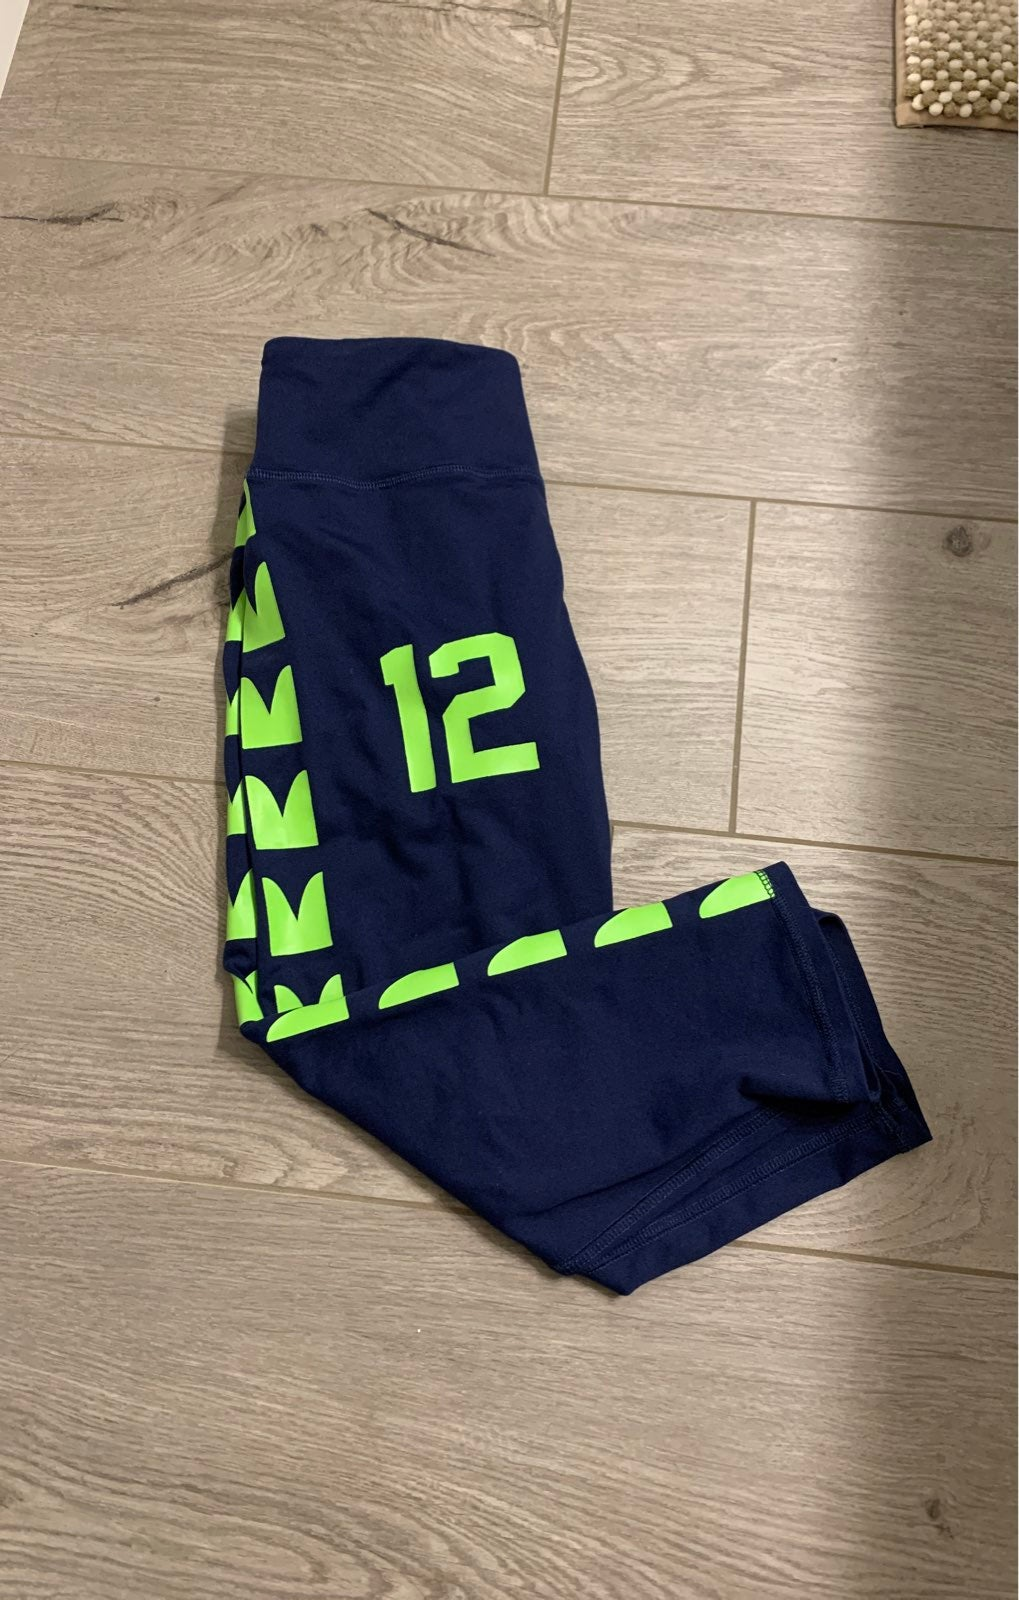 Seattle seahawk NFL legging/capris